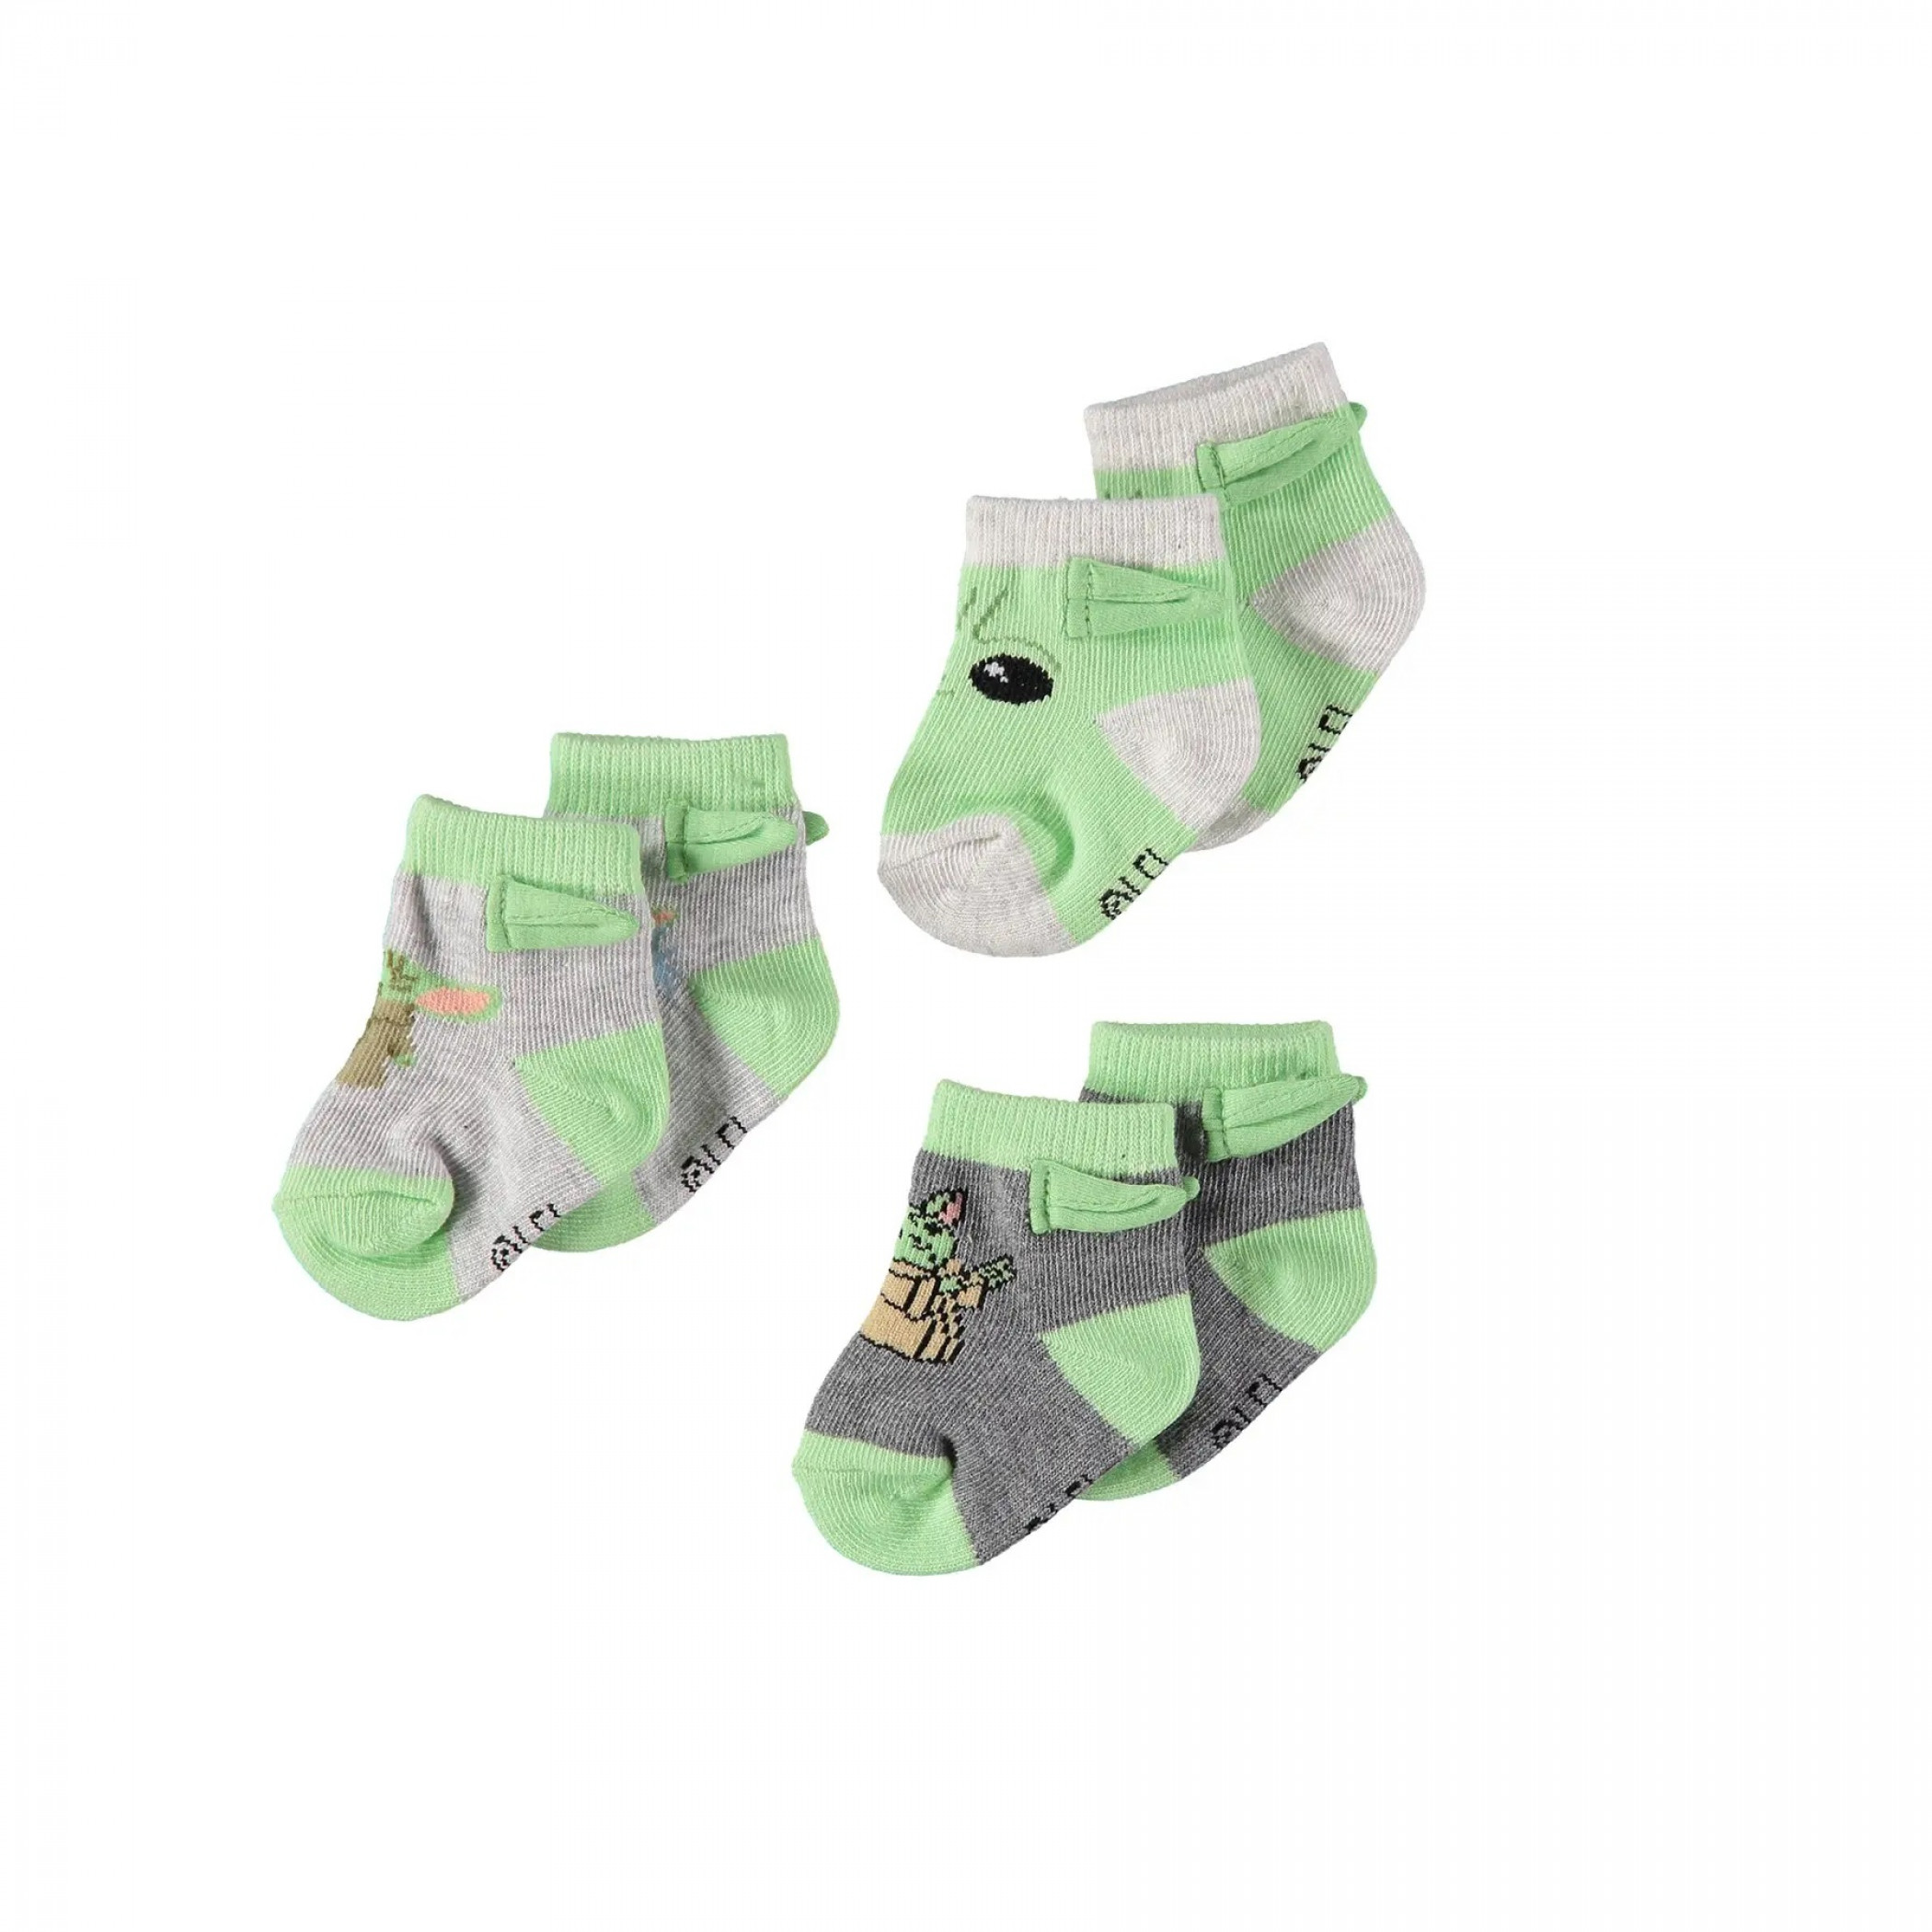 Star Wars The Mandalorian Grogu Booties Sock 3-Pack